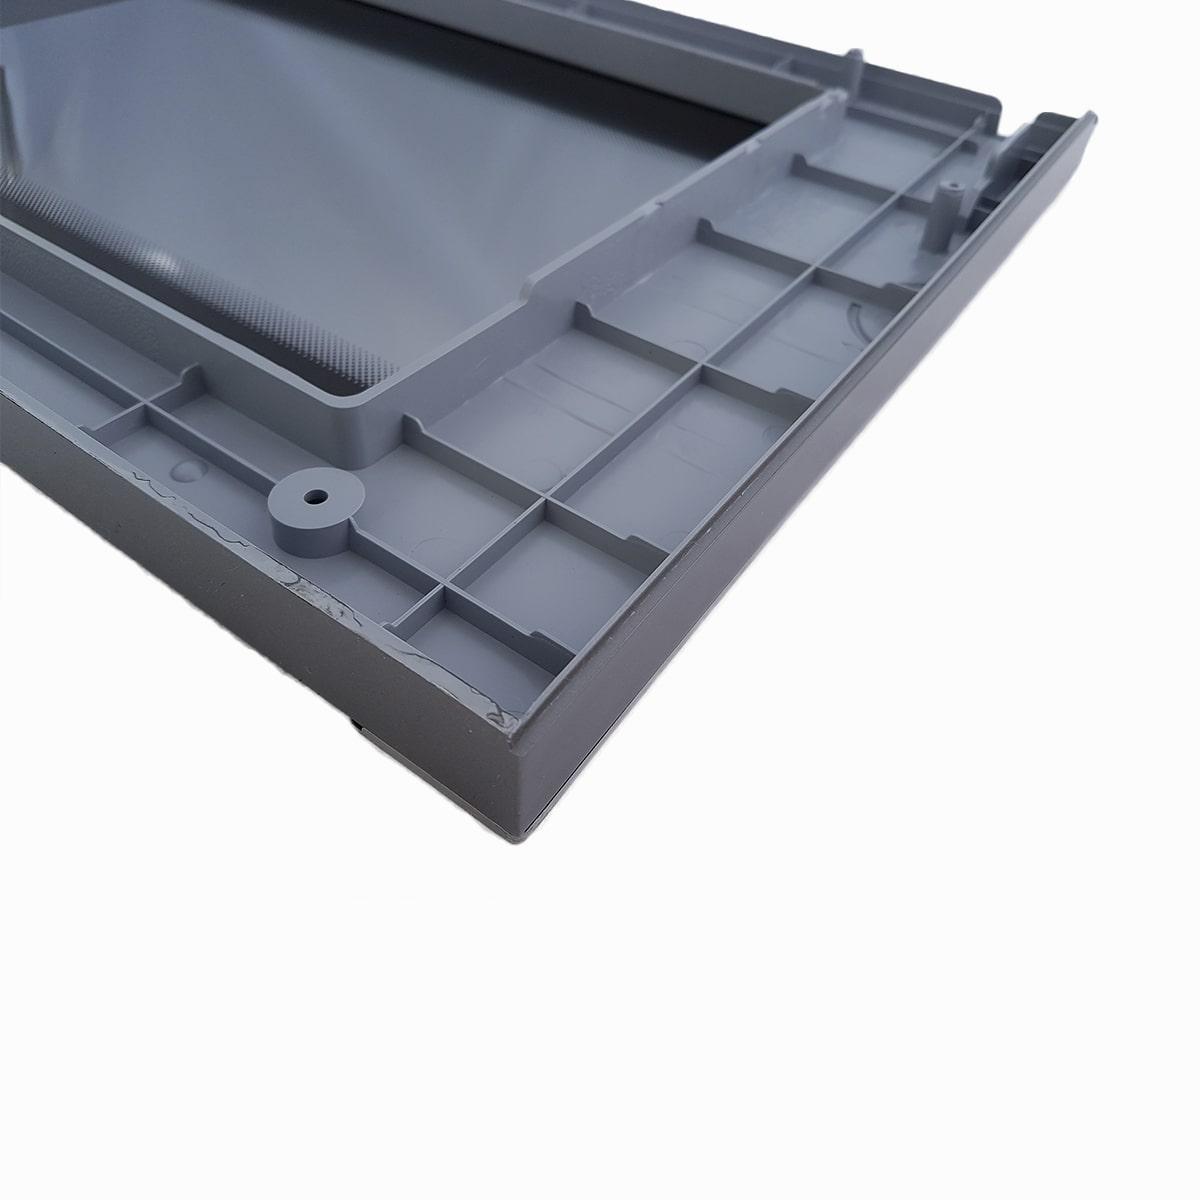 Parte Externa Da Porta Inox Forno Electrolux Fb54x - JS1G0609976210801